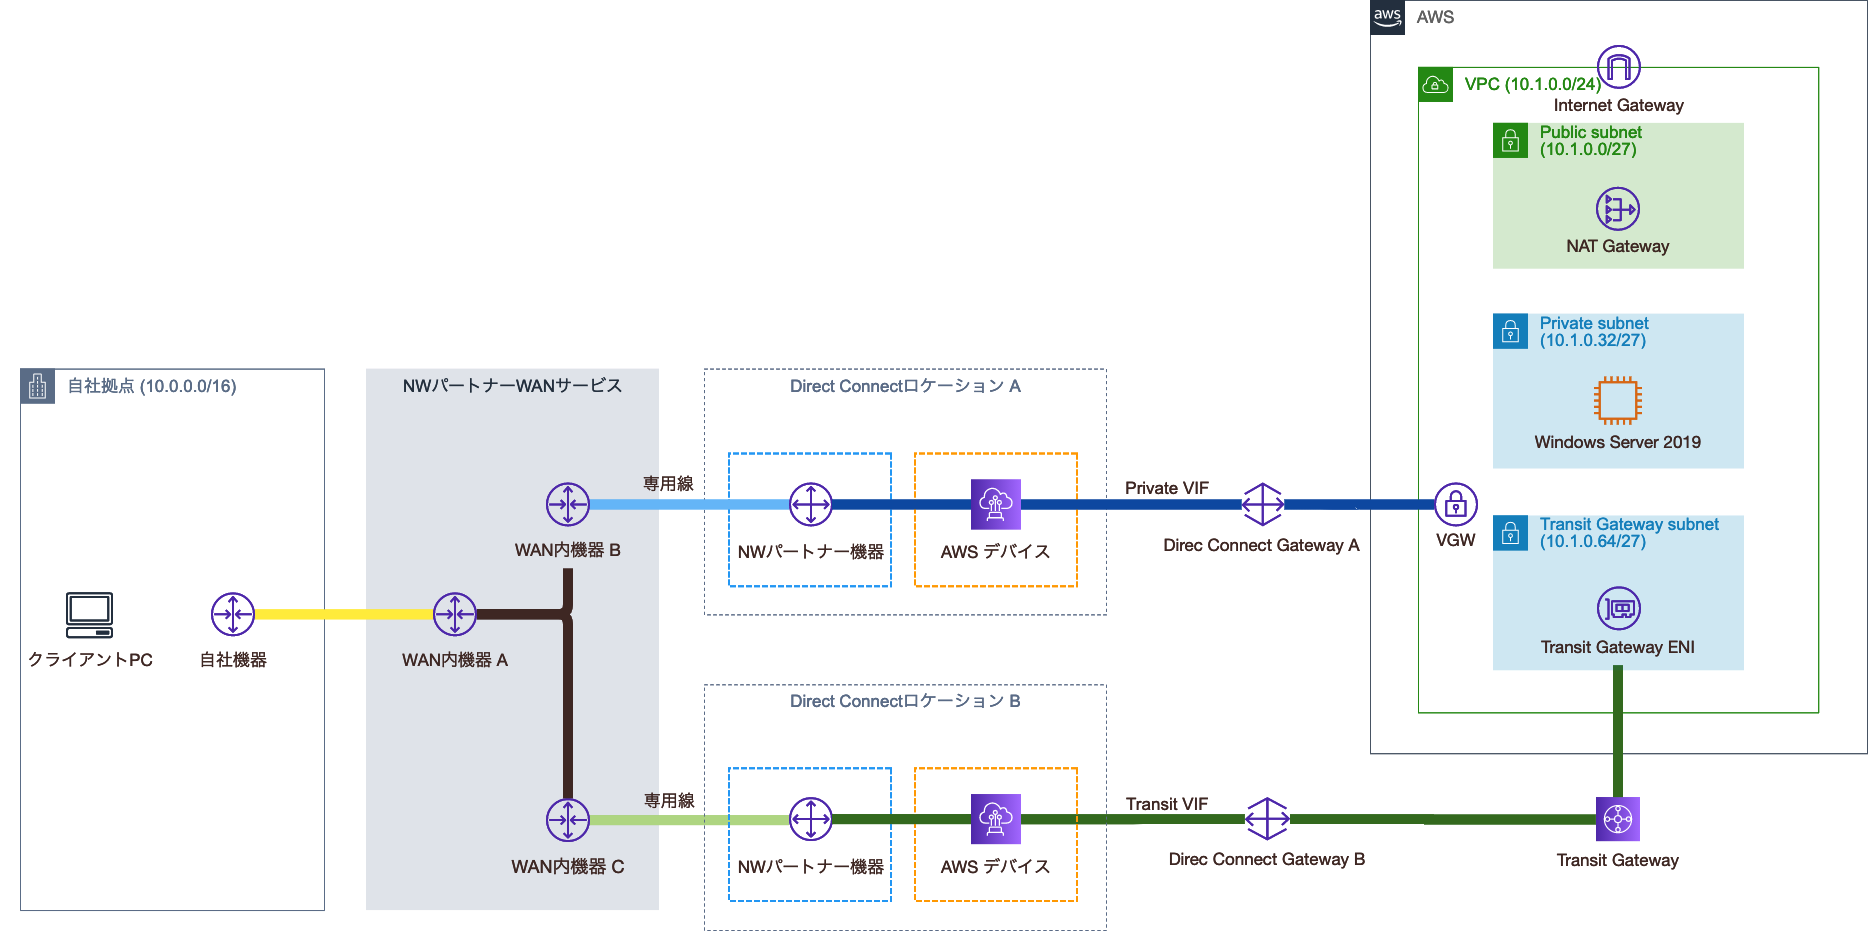 Transit Gateway Attachment作成後の構成図